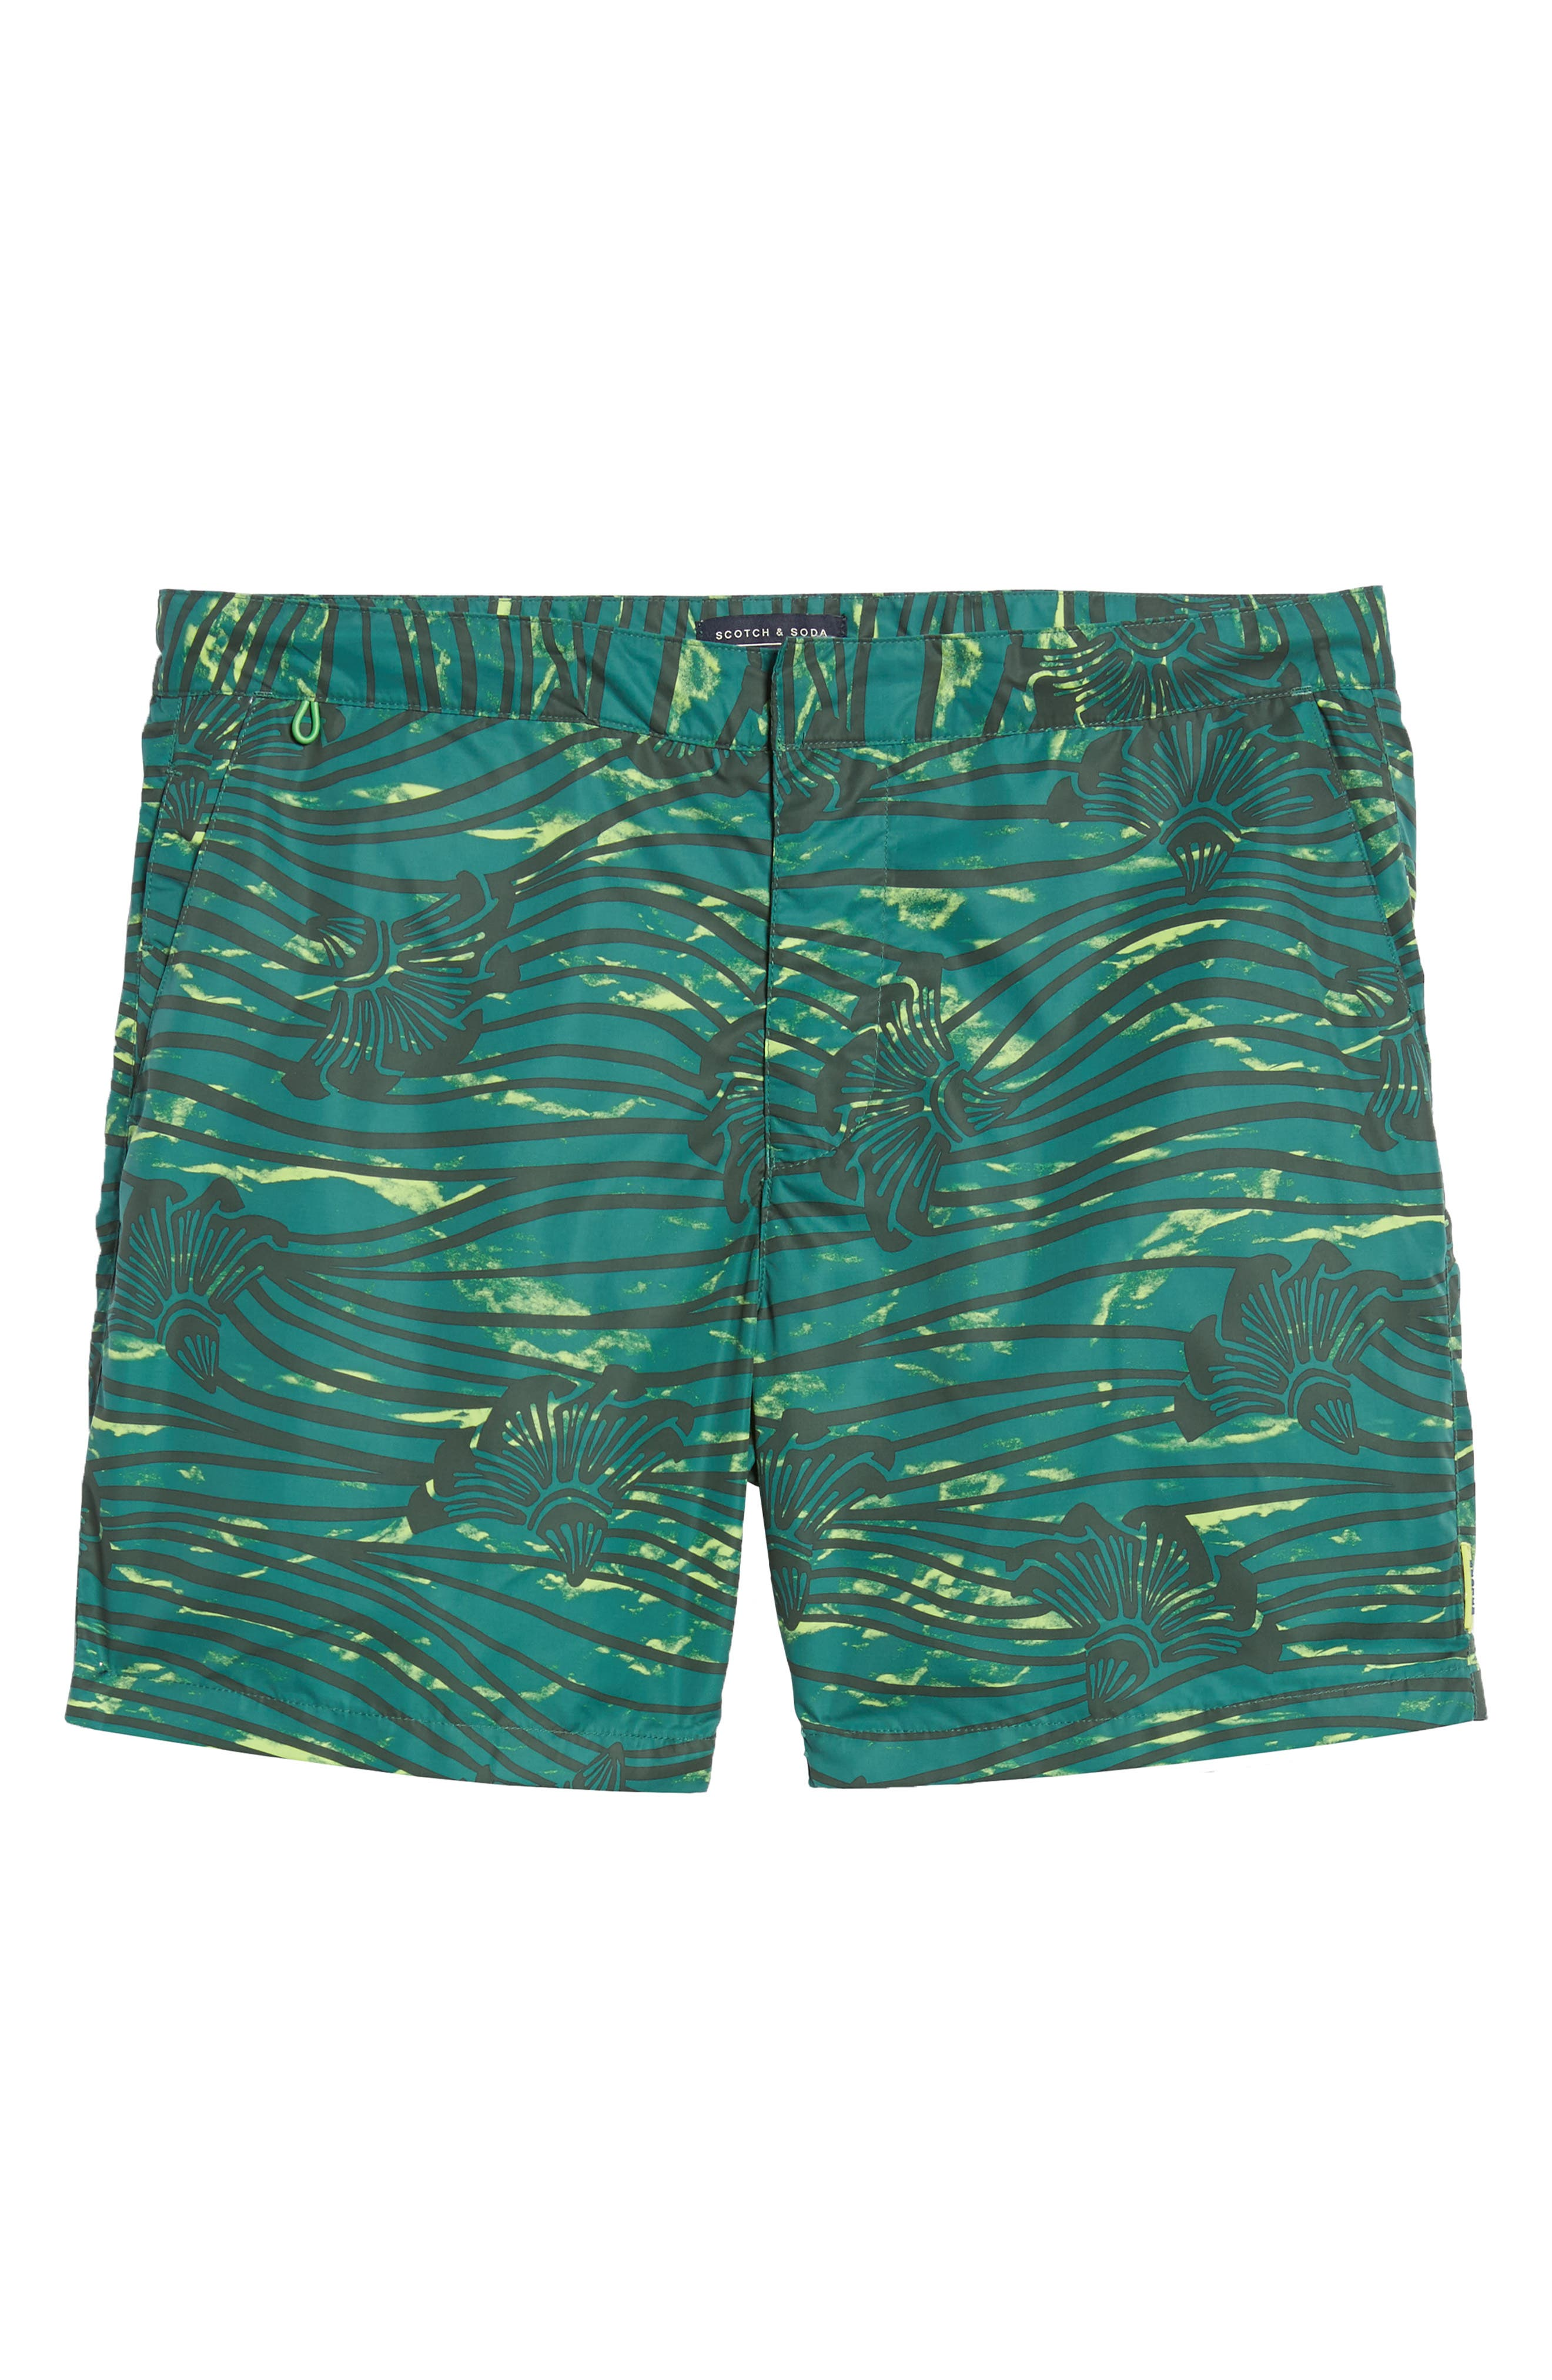 Patterned Board Shorts,                             Alternate thumbnail 6, color,                             Combo E